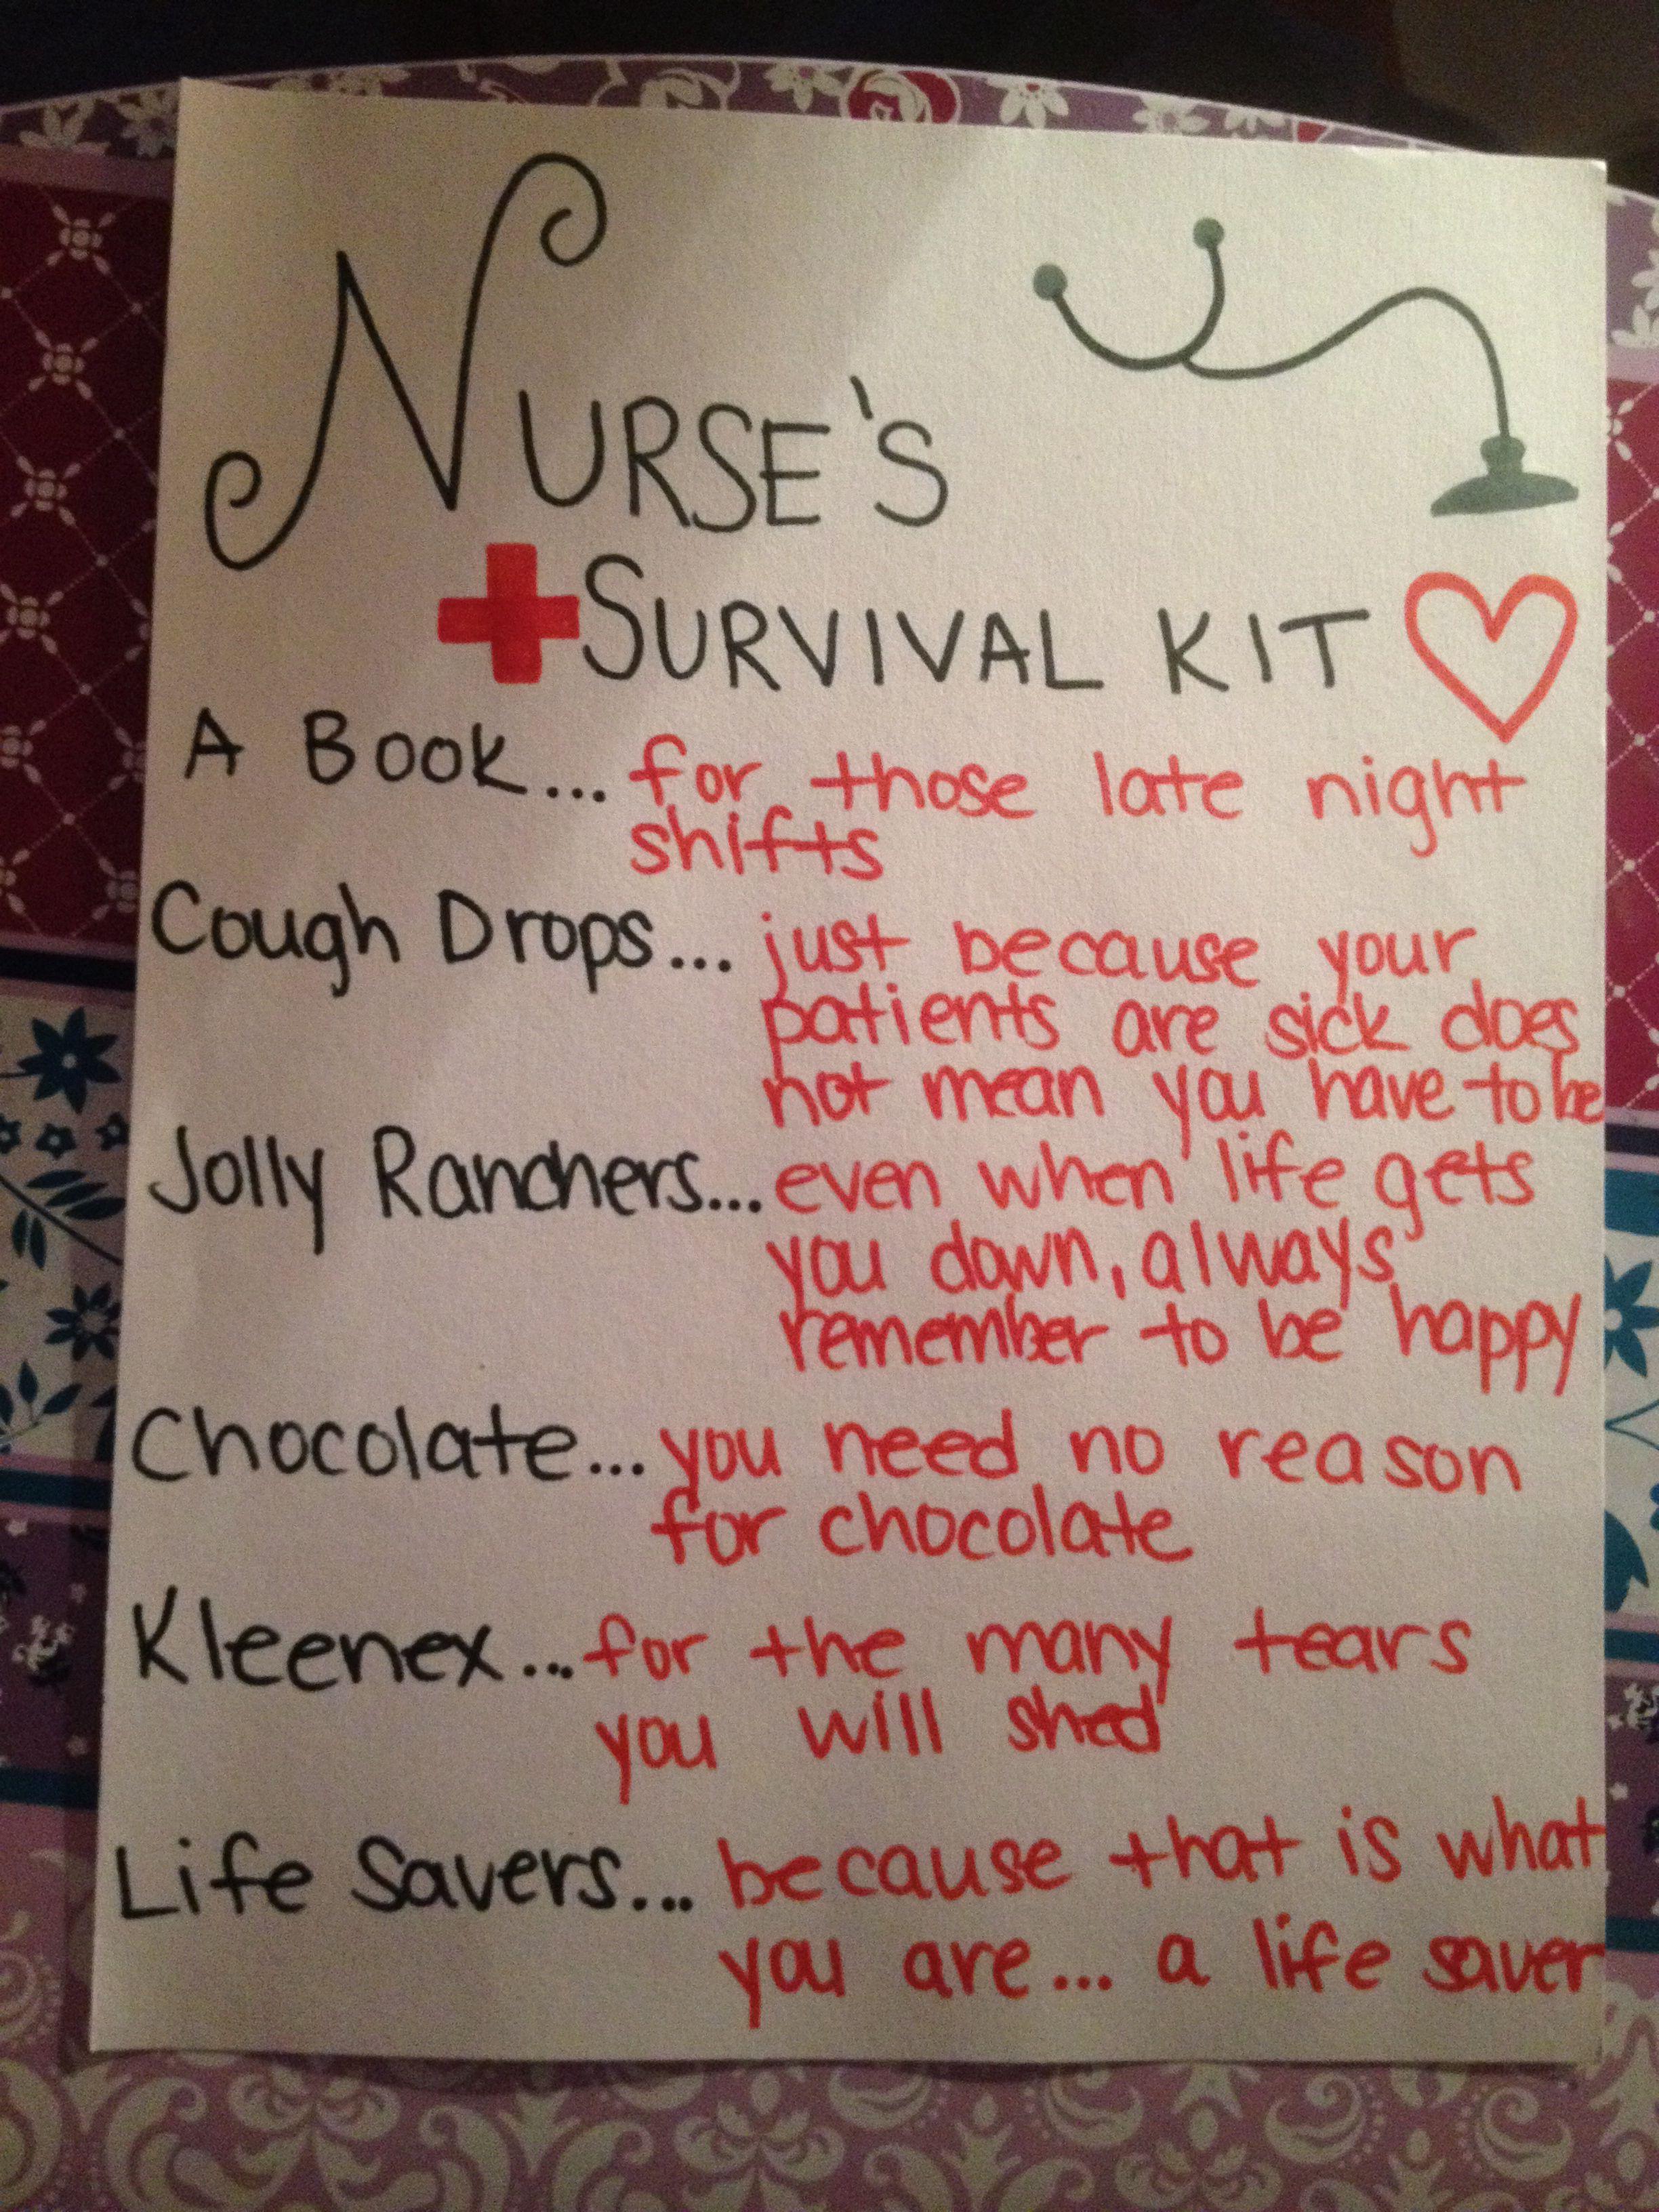 Nurse's Survival Kit Survival kit, Survival kit gifts